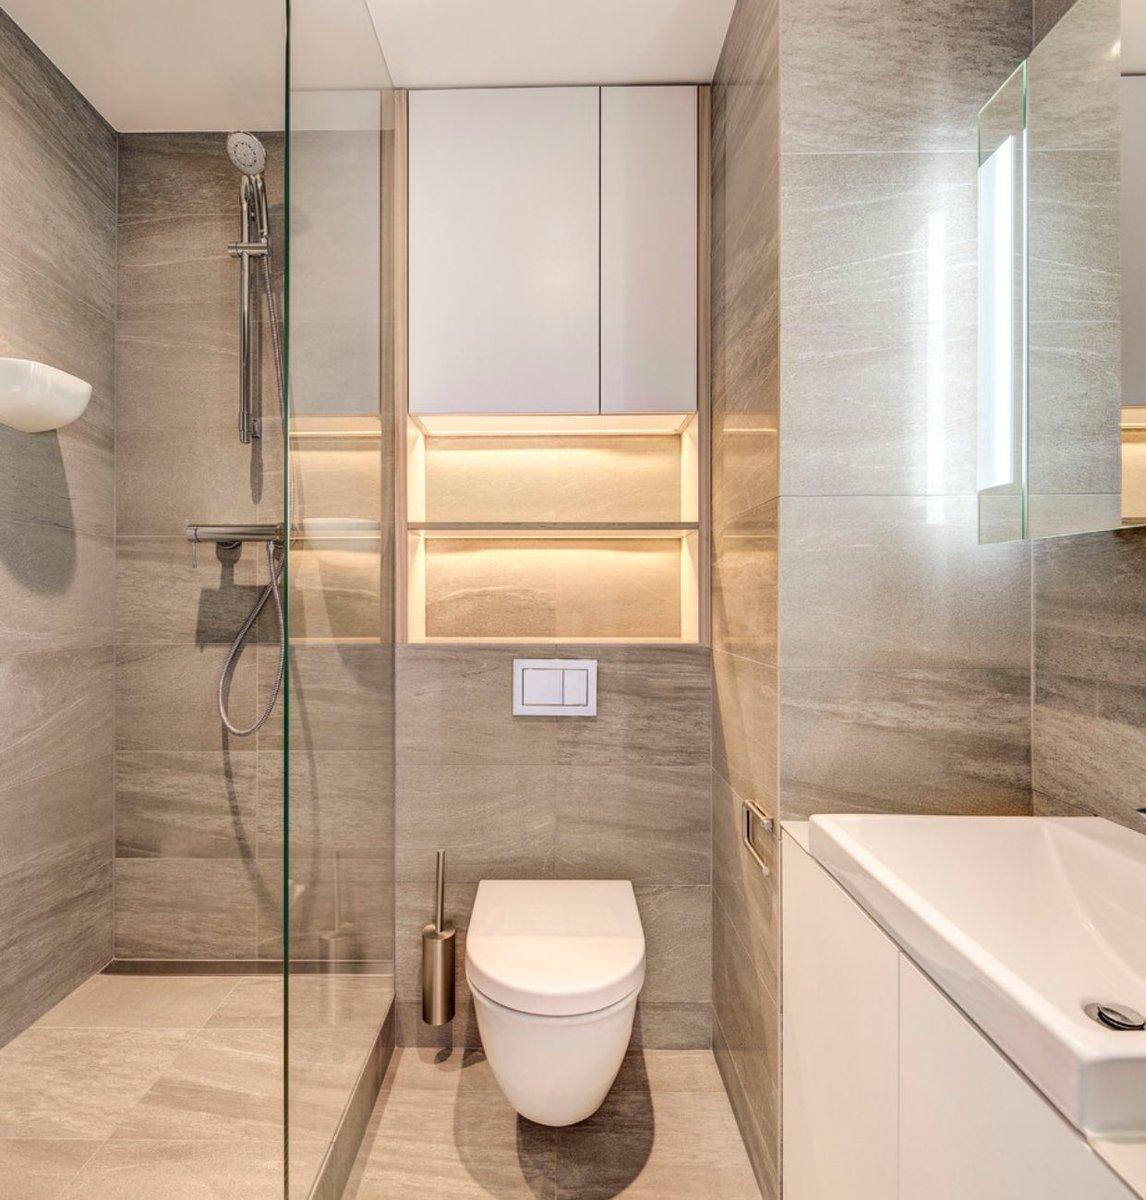 بالصور تصميم حمامات , اجمل ديكورات الحمامات 3285 6